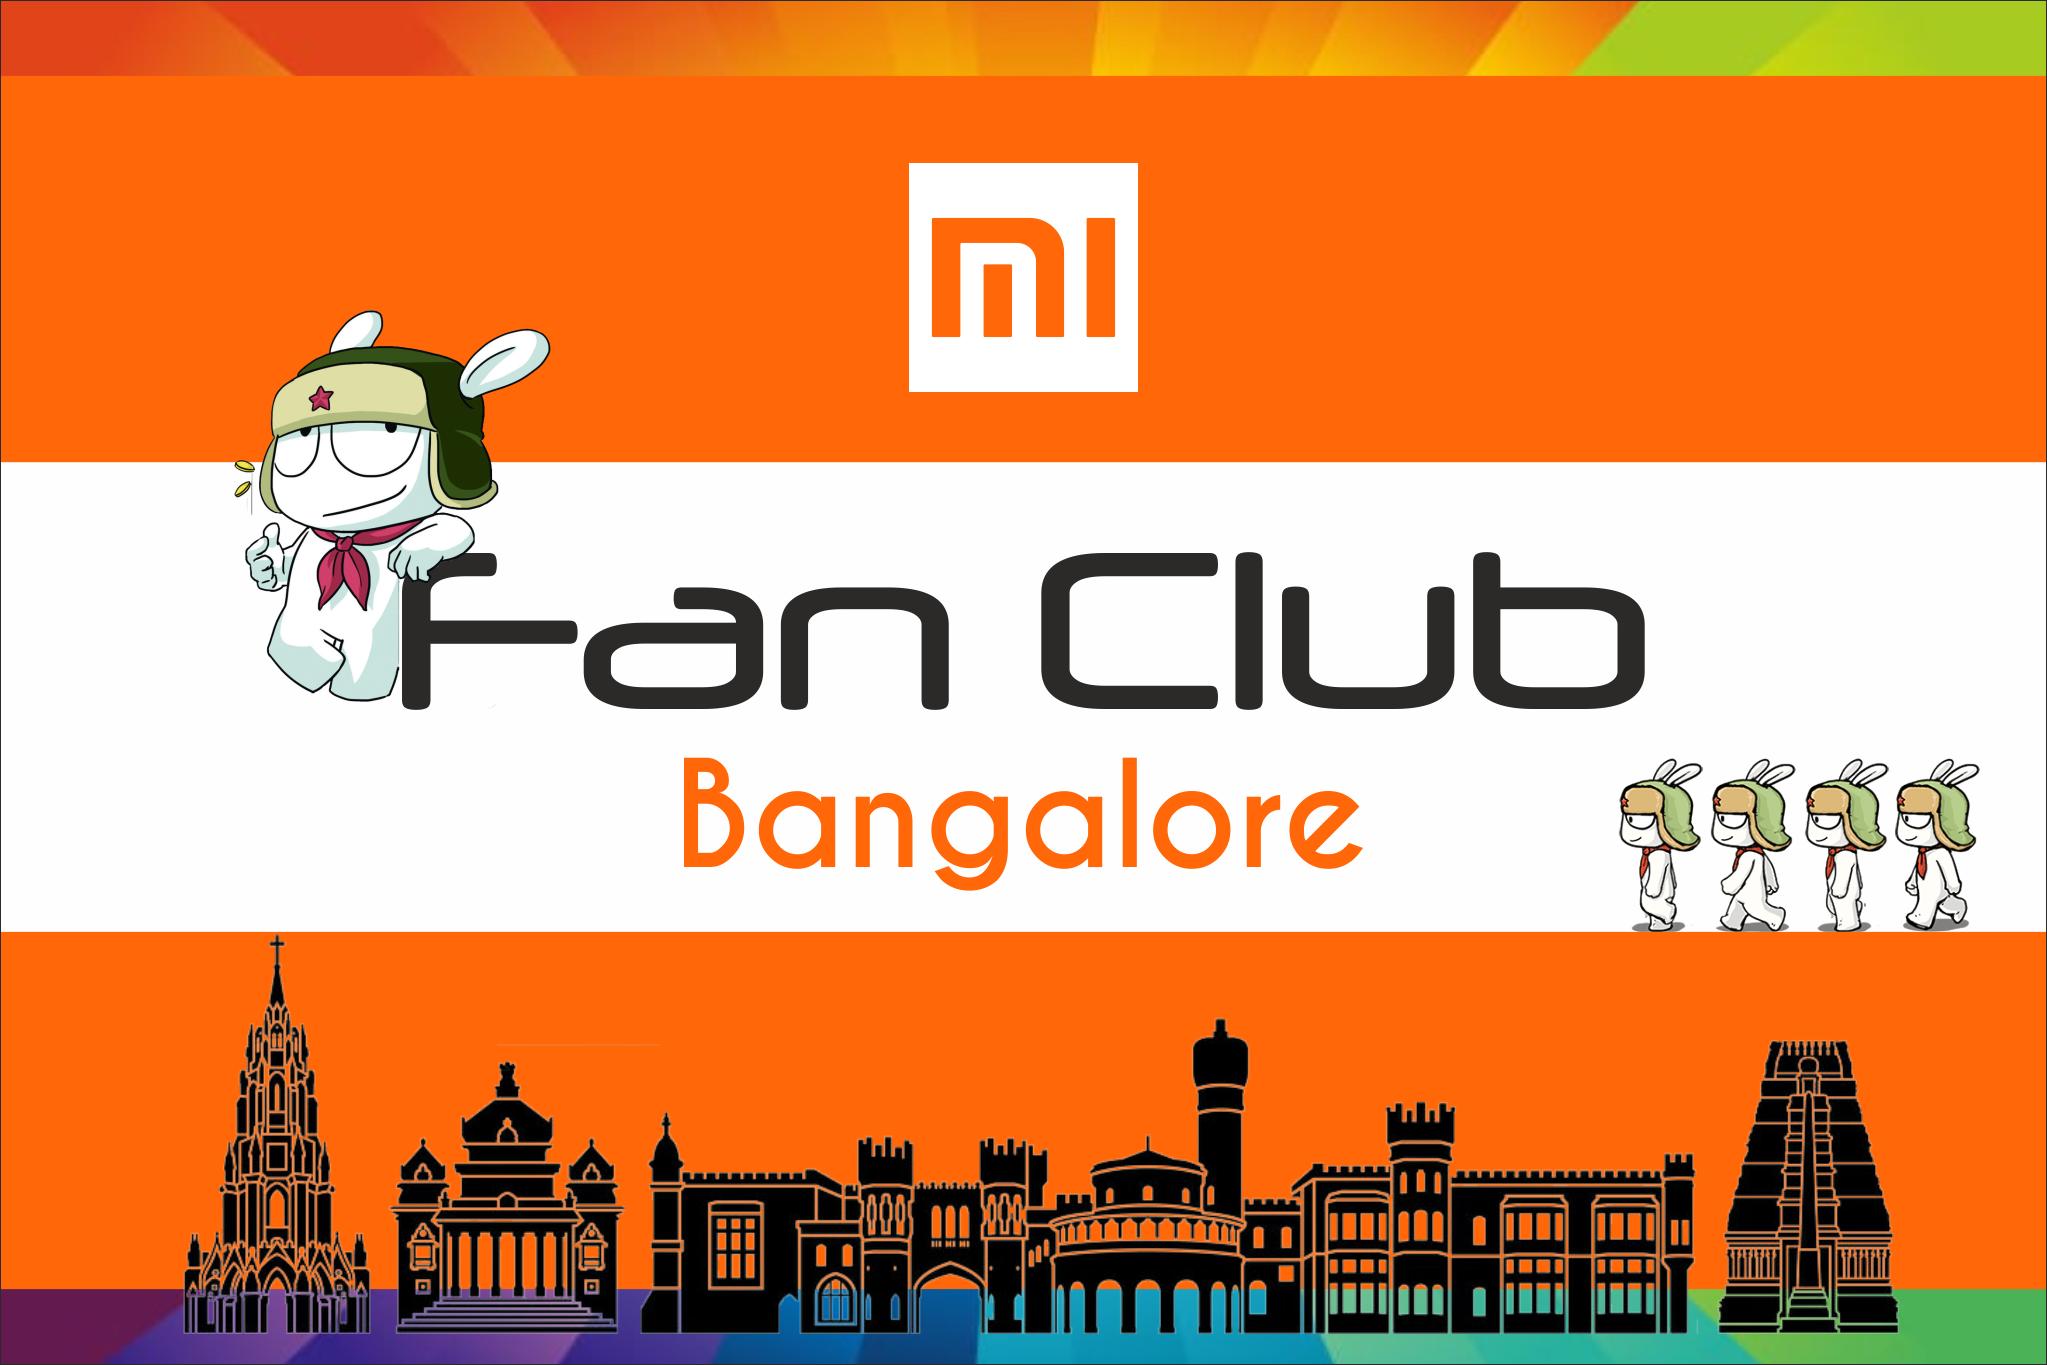 mi fans club bangalore-2.png